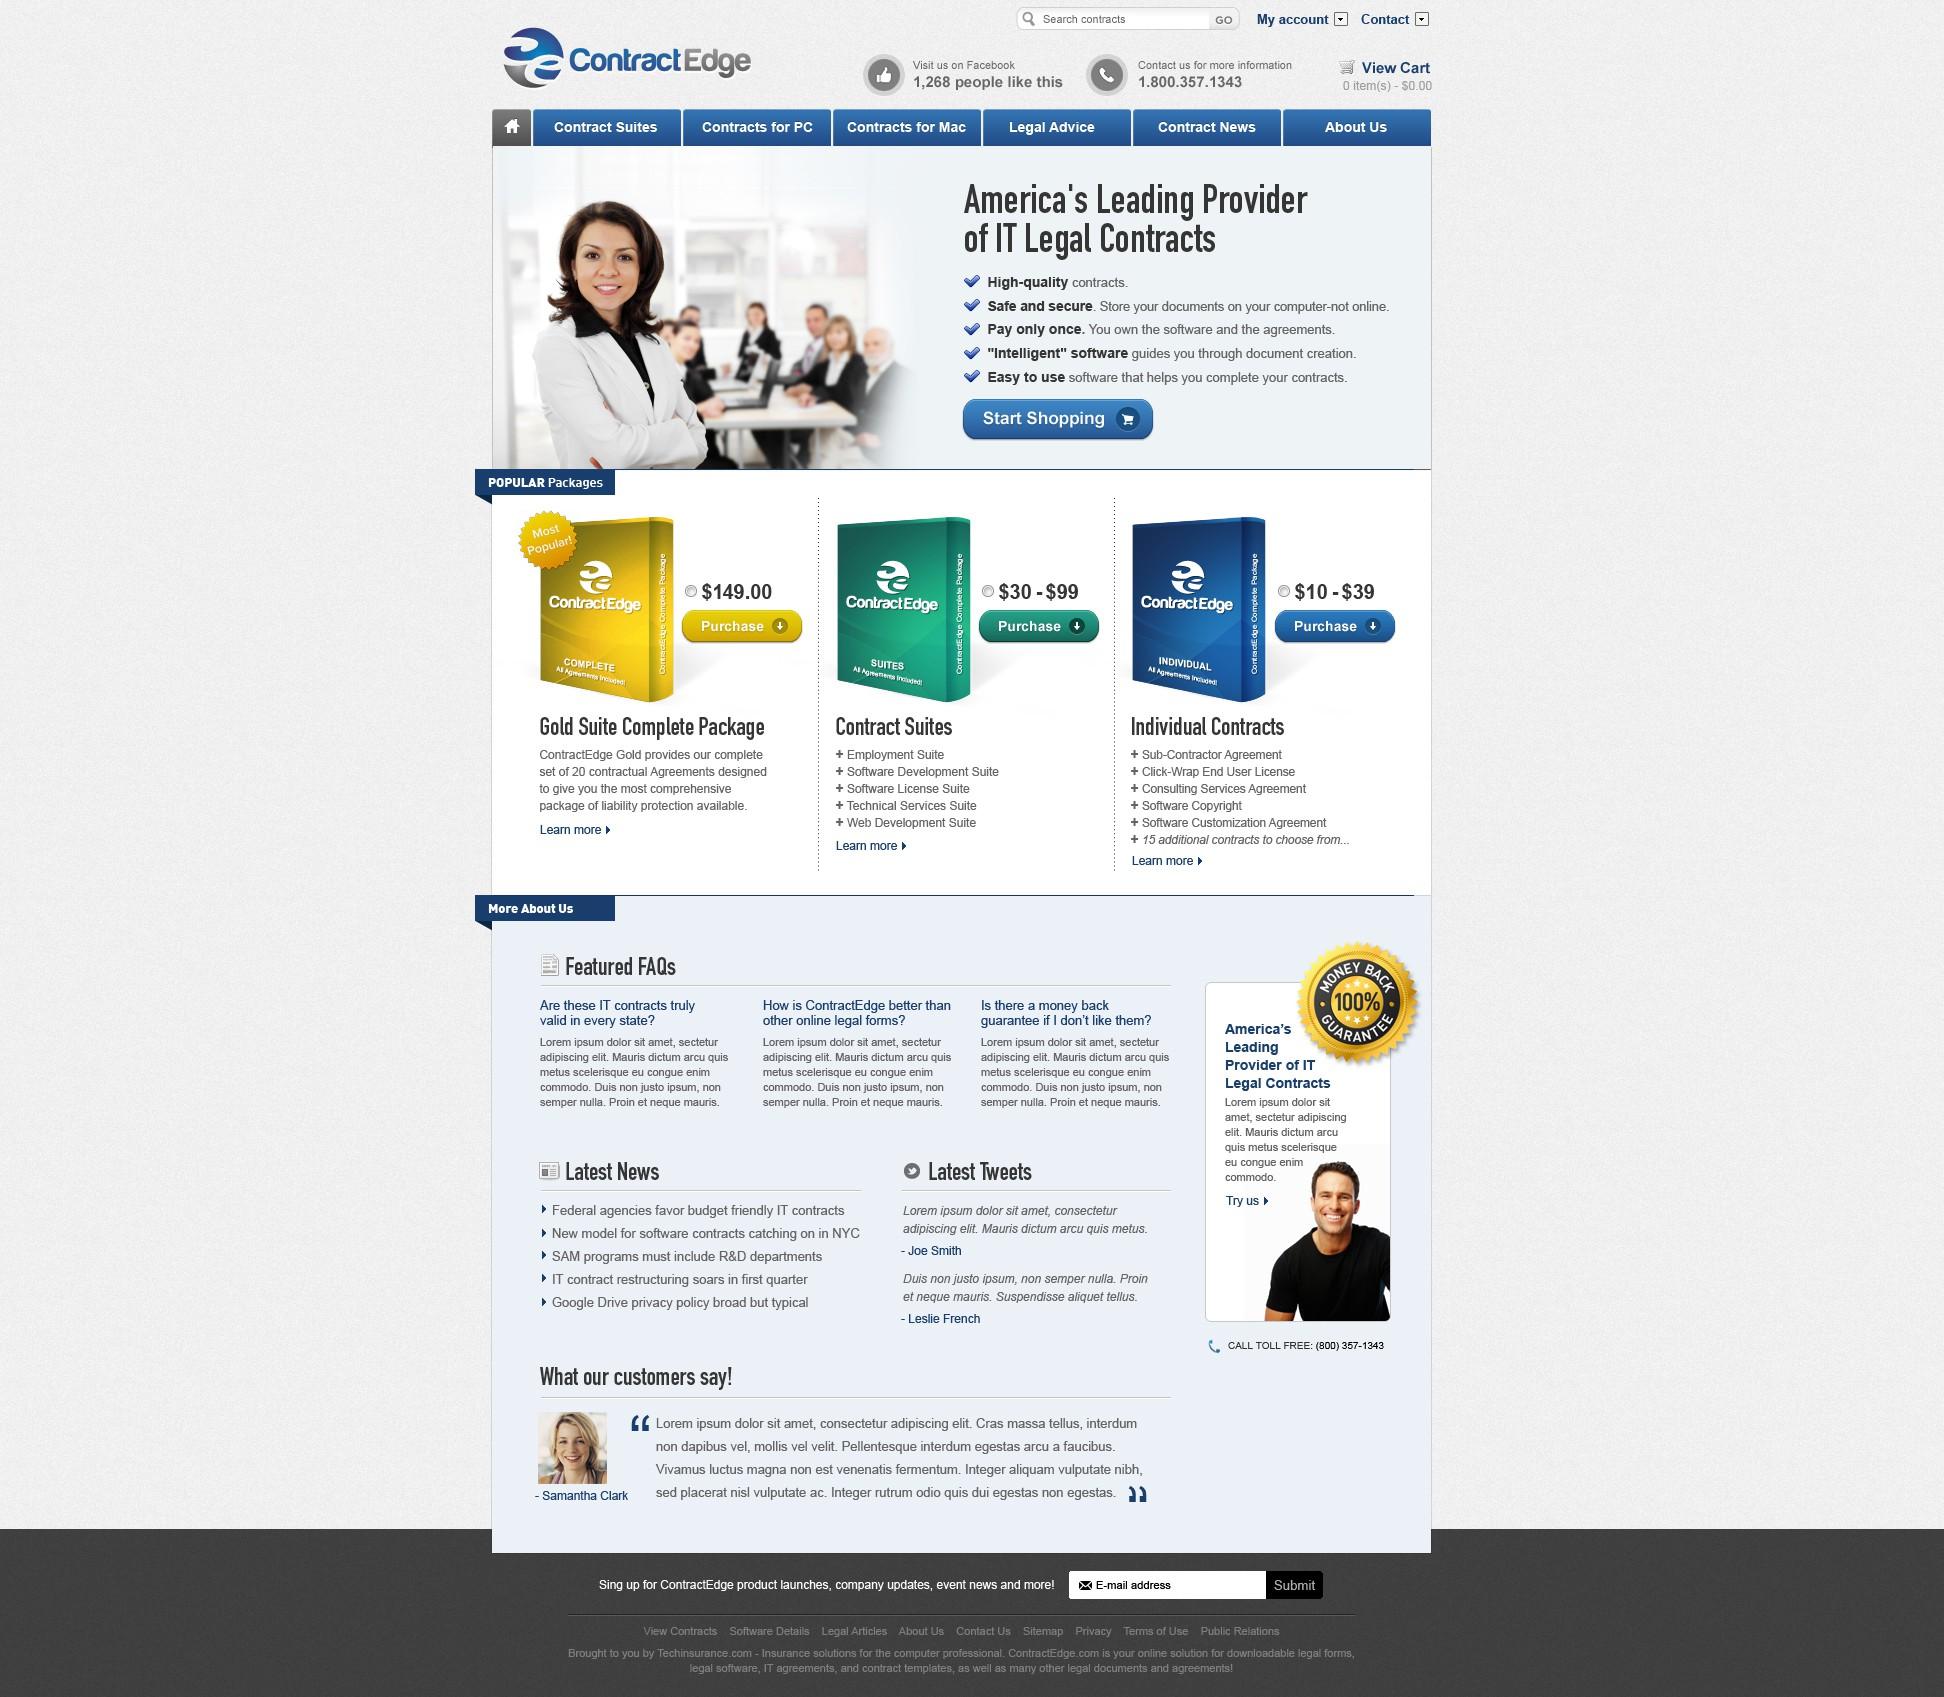 Contract Edge needs a new website design